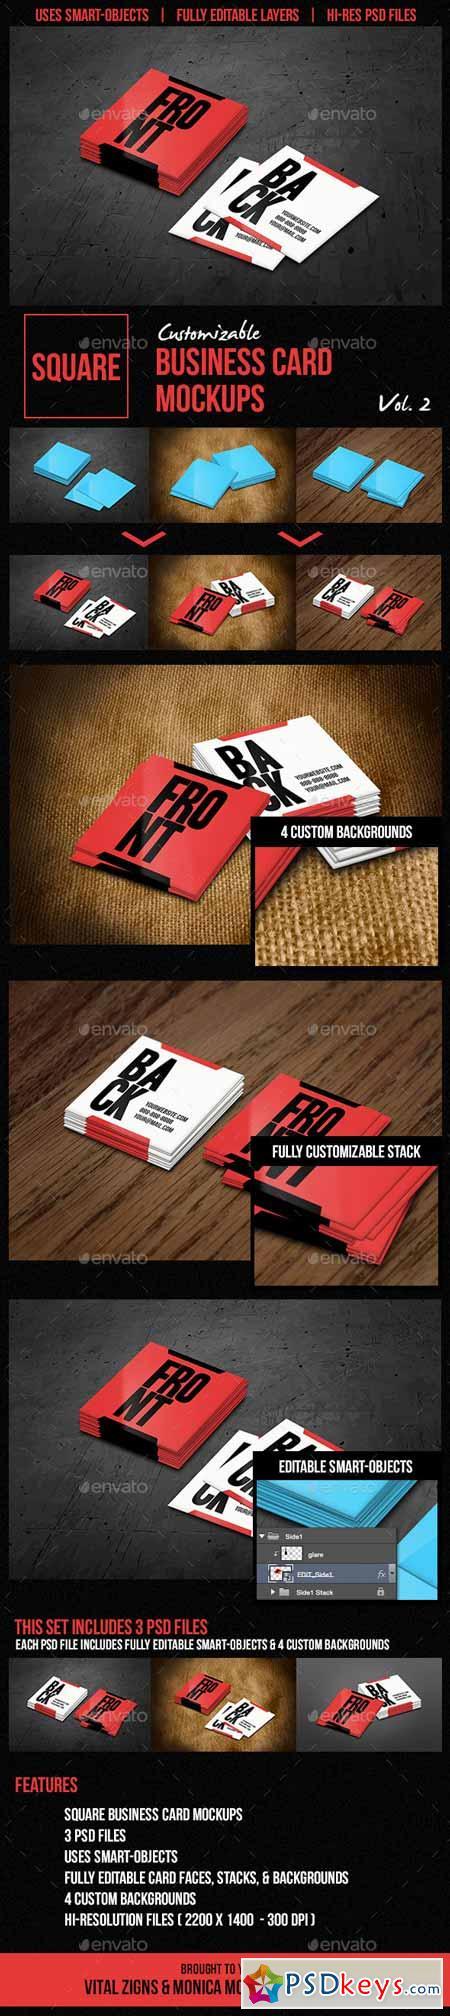 Square business card mockups vol 2 11644576 free download square business card mockups vol 2 11644576 reheart Image collections